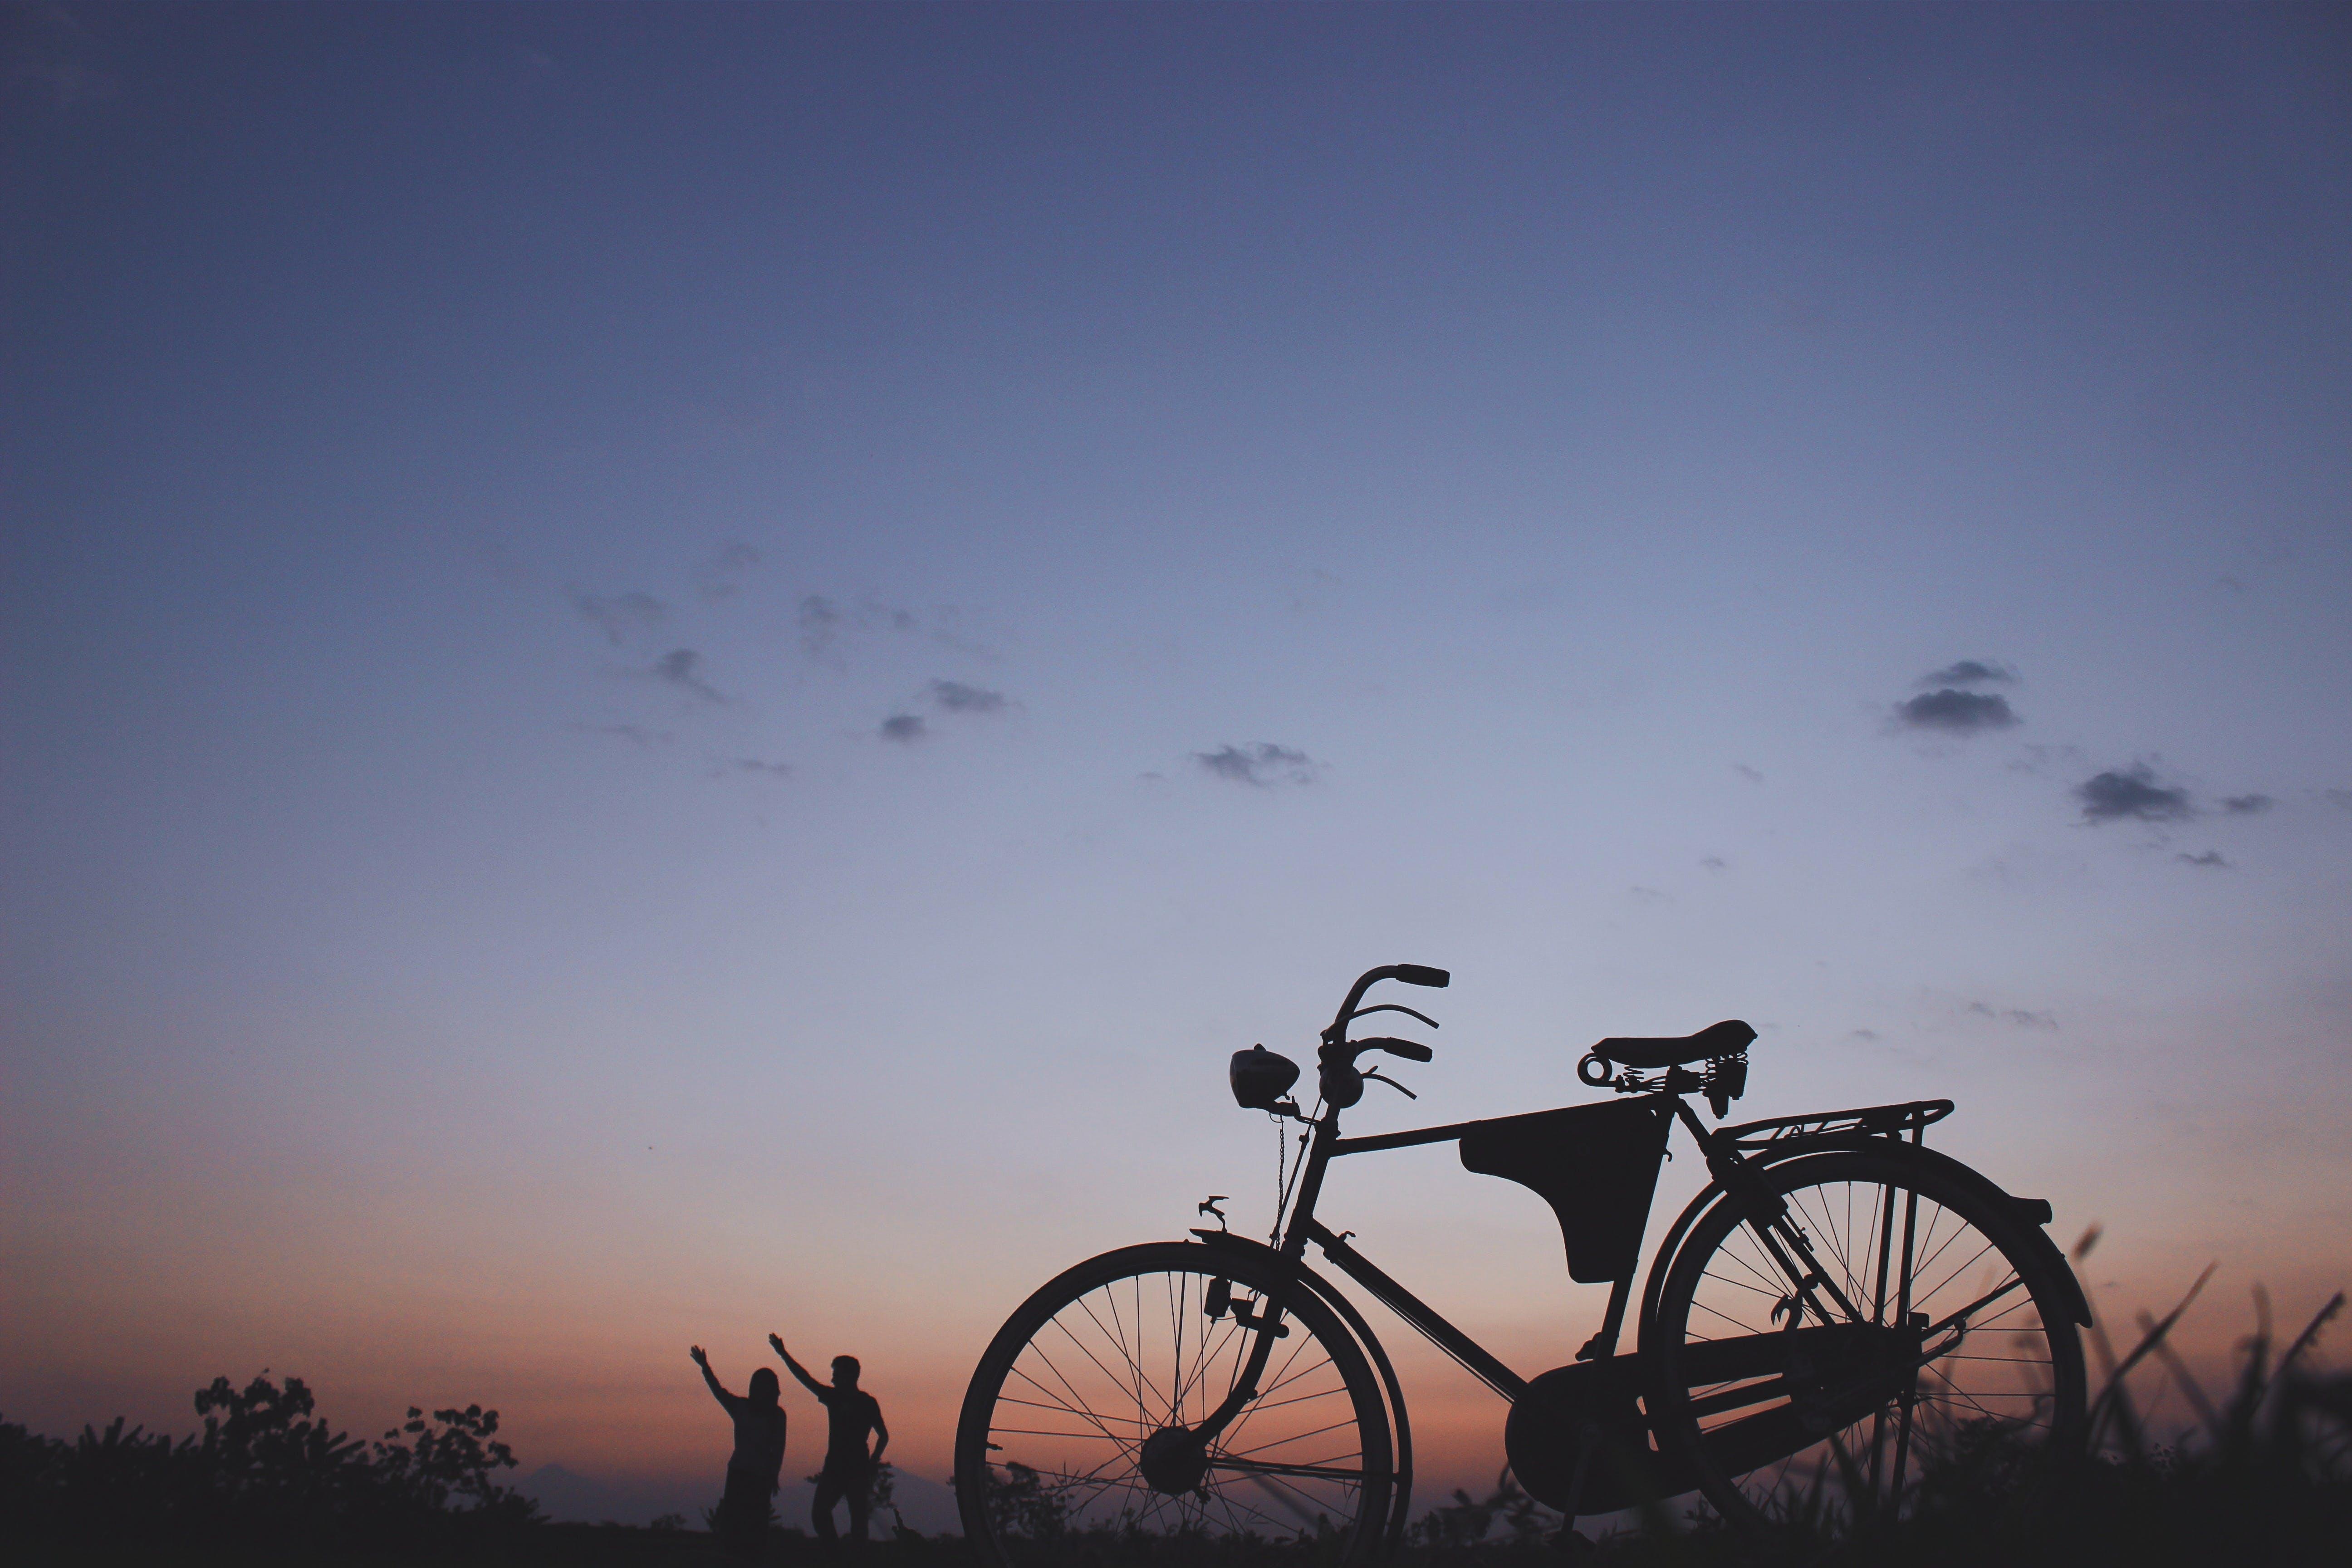 Silhouette of Commuter Bike